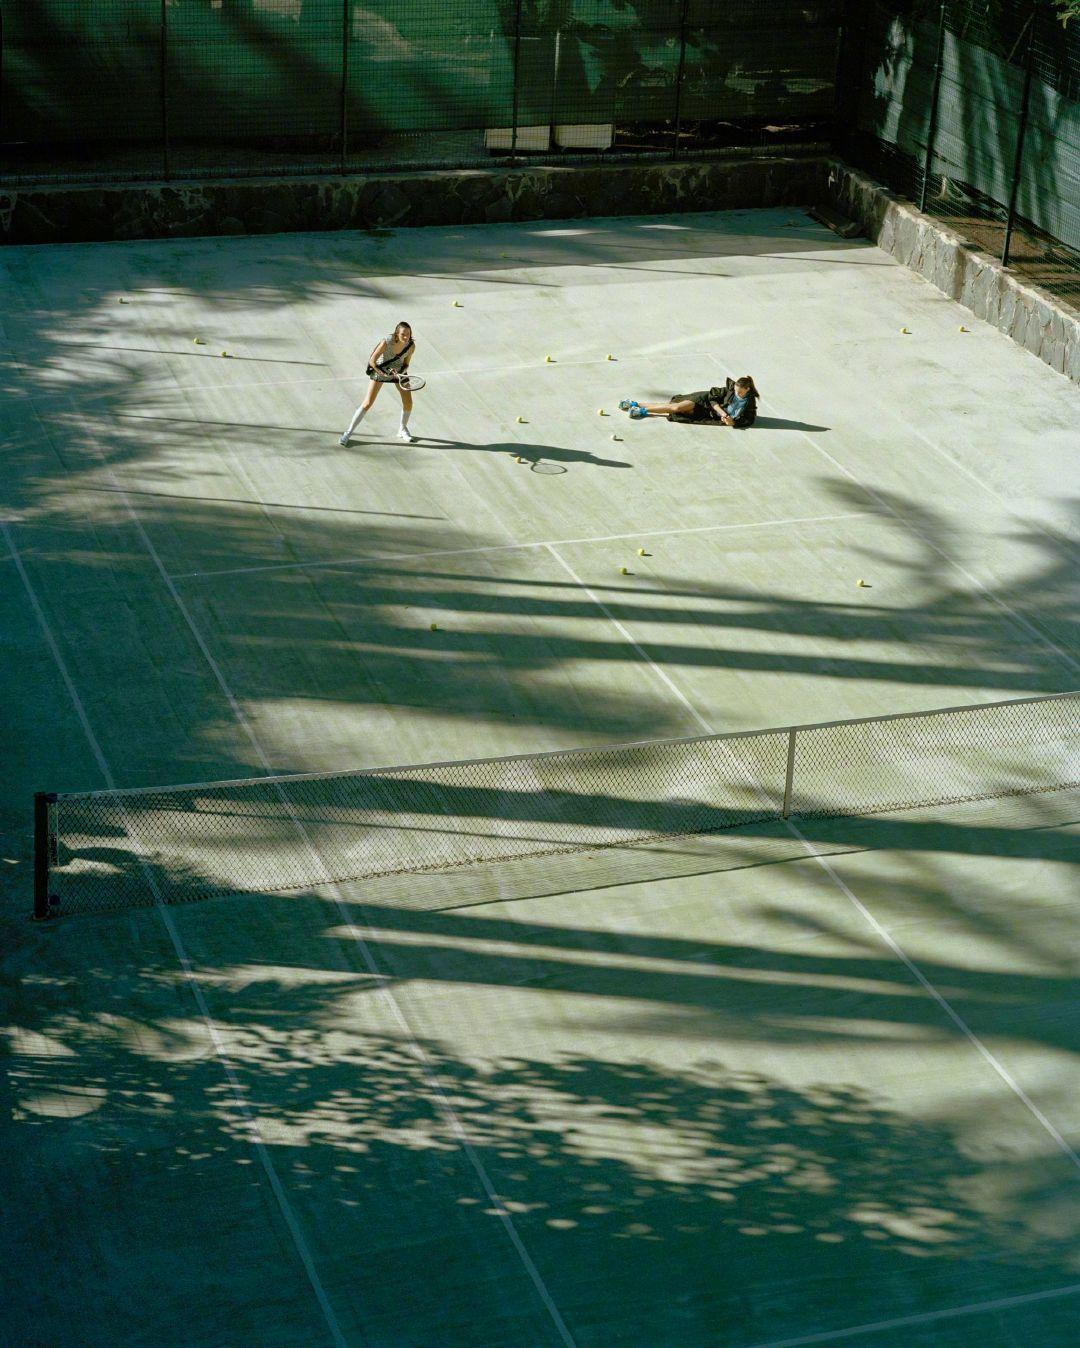 Photography by Francesco Nazardo -觅爱图